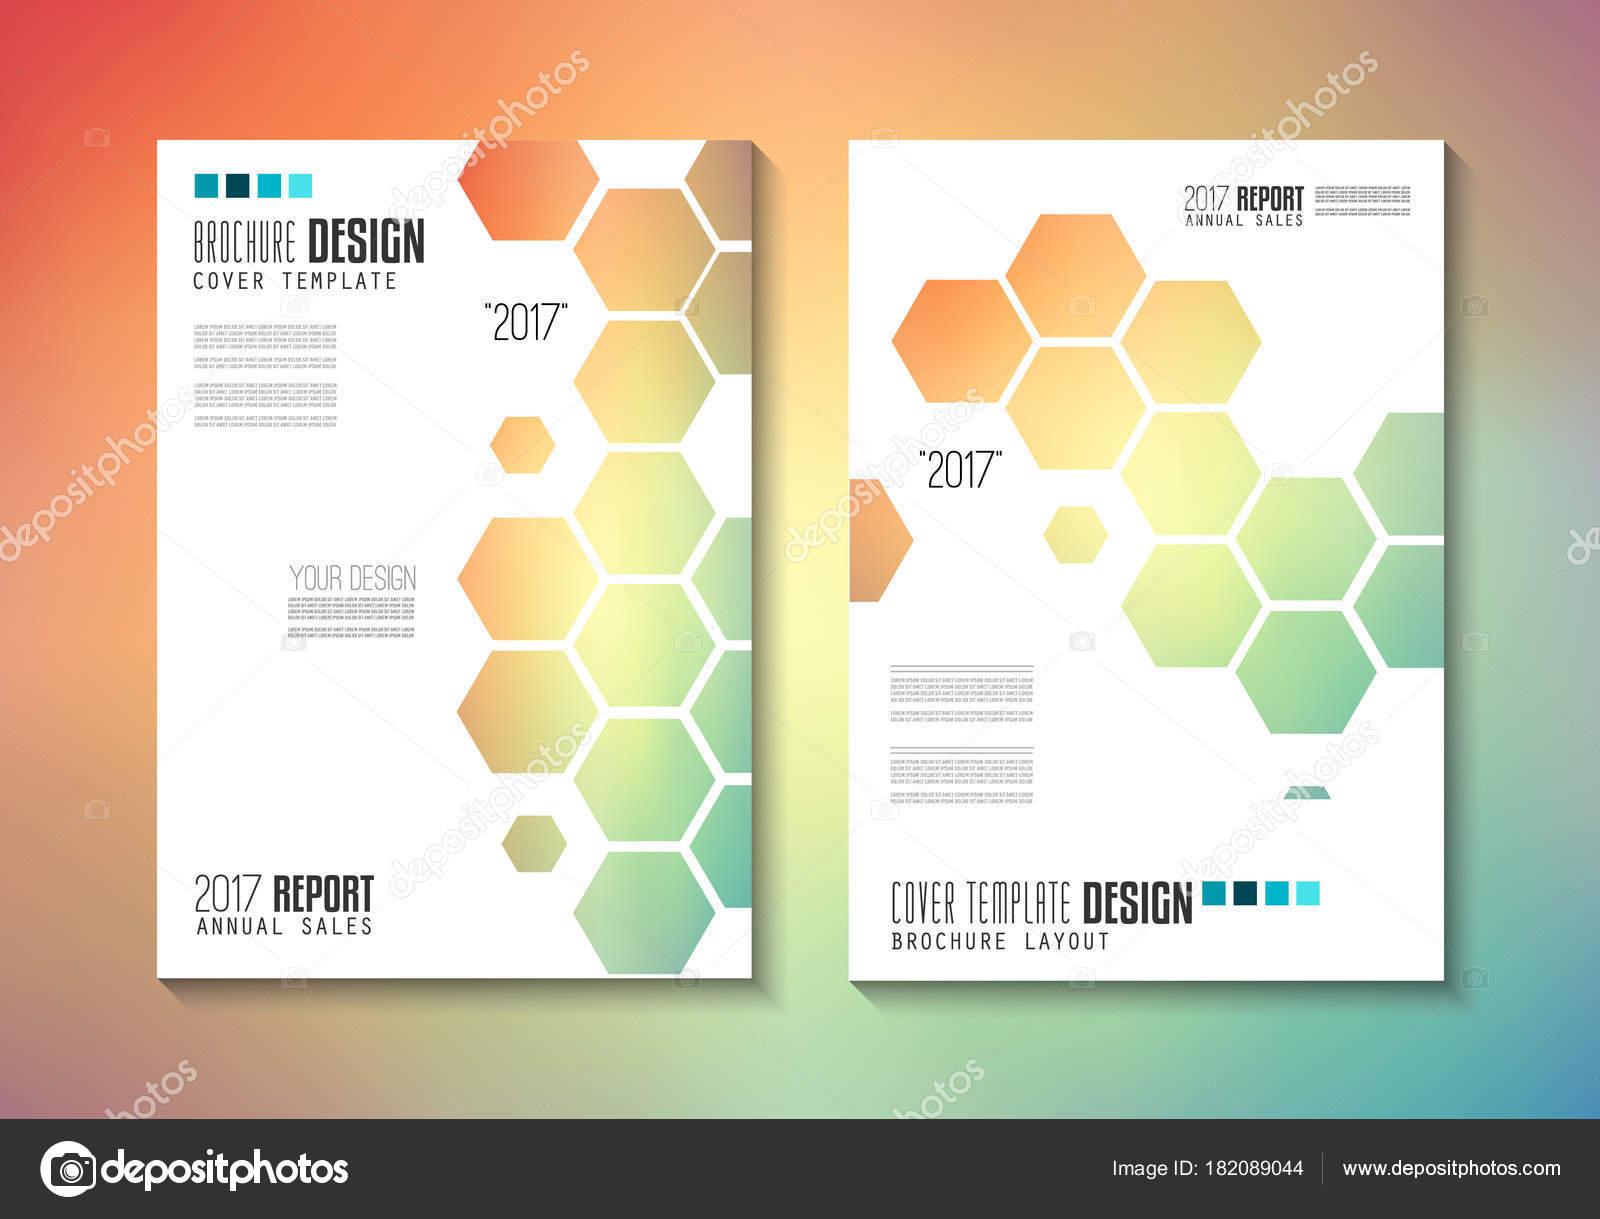 Brochure Template Flyer Design Depliant Cover Business Purposes ...